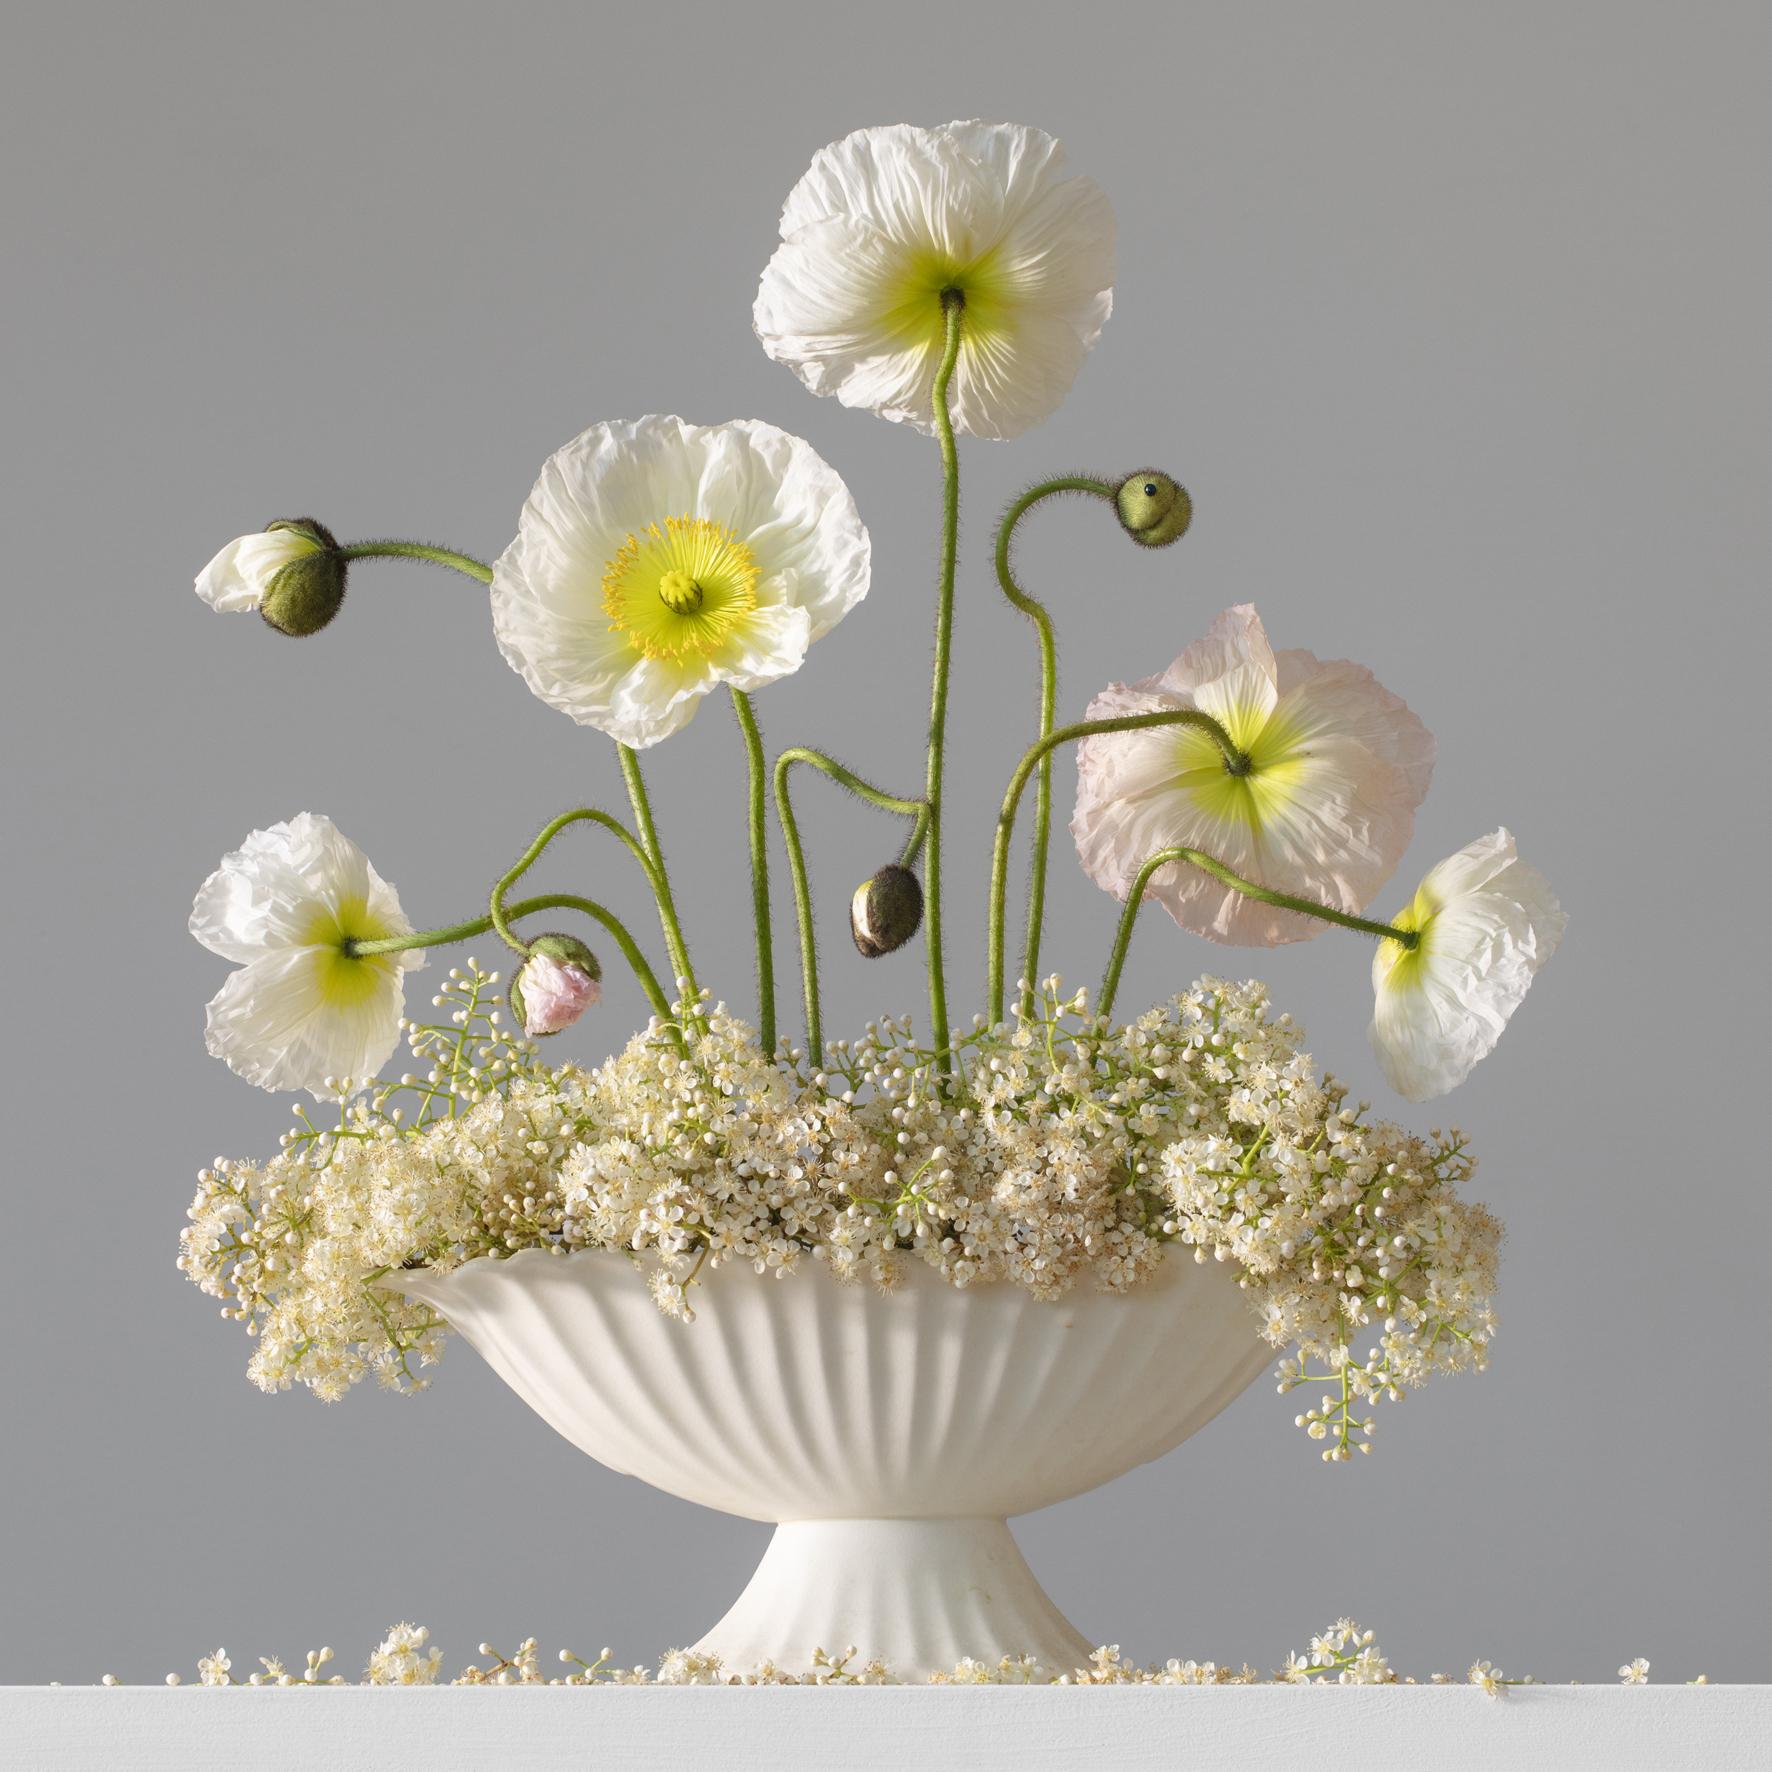 Poppies White 4.45 pm.jpg